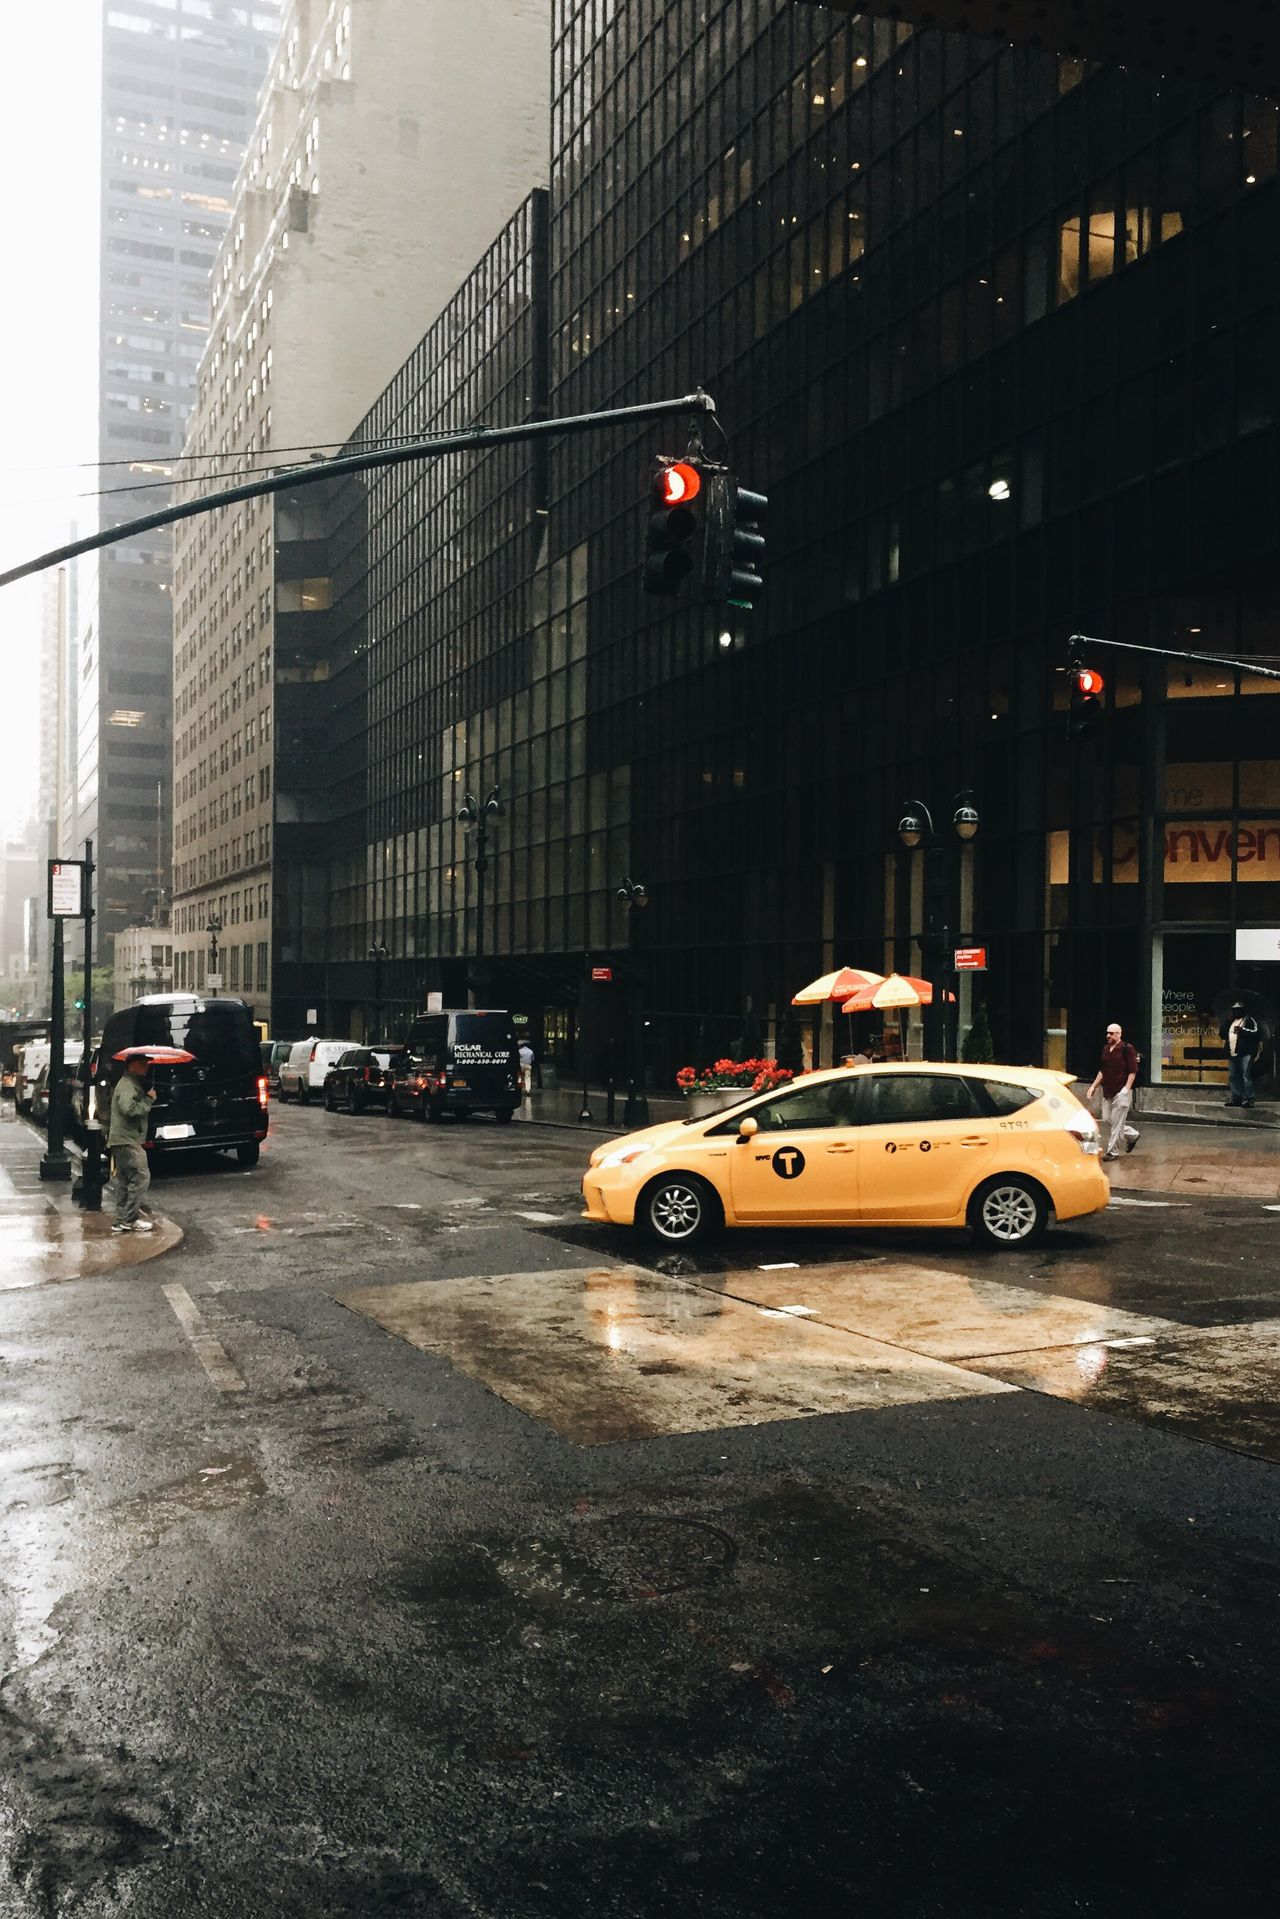 NYC moodyness. Cityscapes Street Life Streetview Mood Mood Captures Colorsplash Yellow Cabs Rainy Days Urban Scene Urban Landscape Urbanexploration Big City Life Travel Destinations Tall Buildings